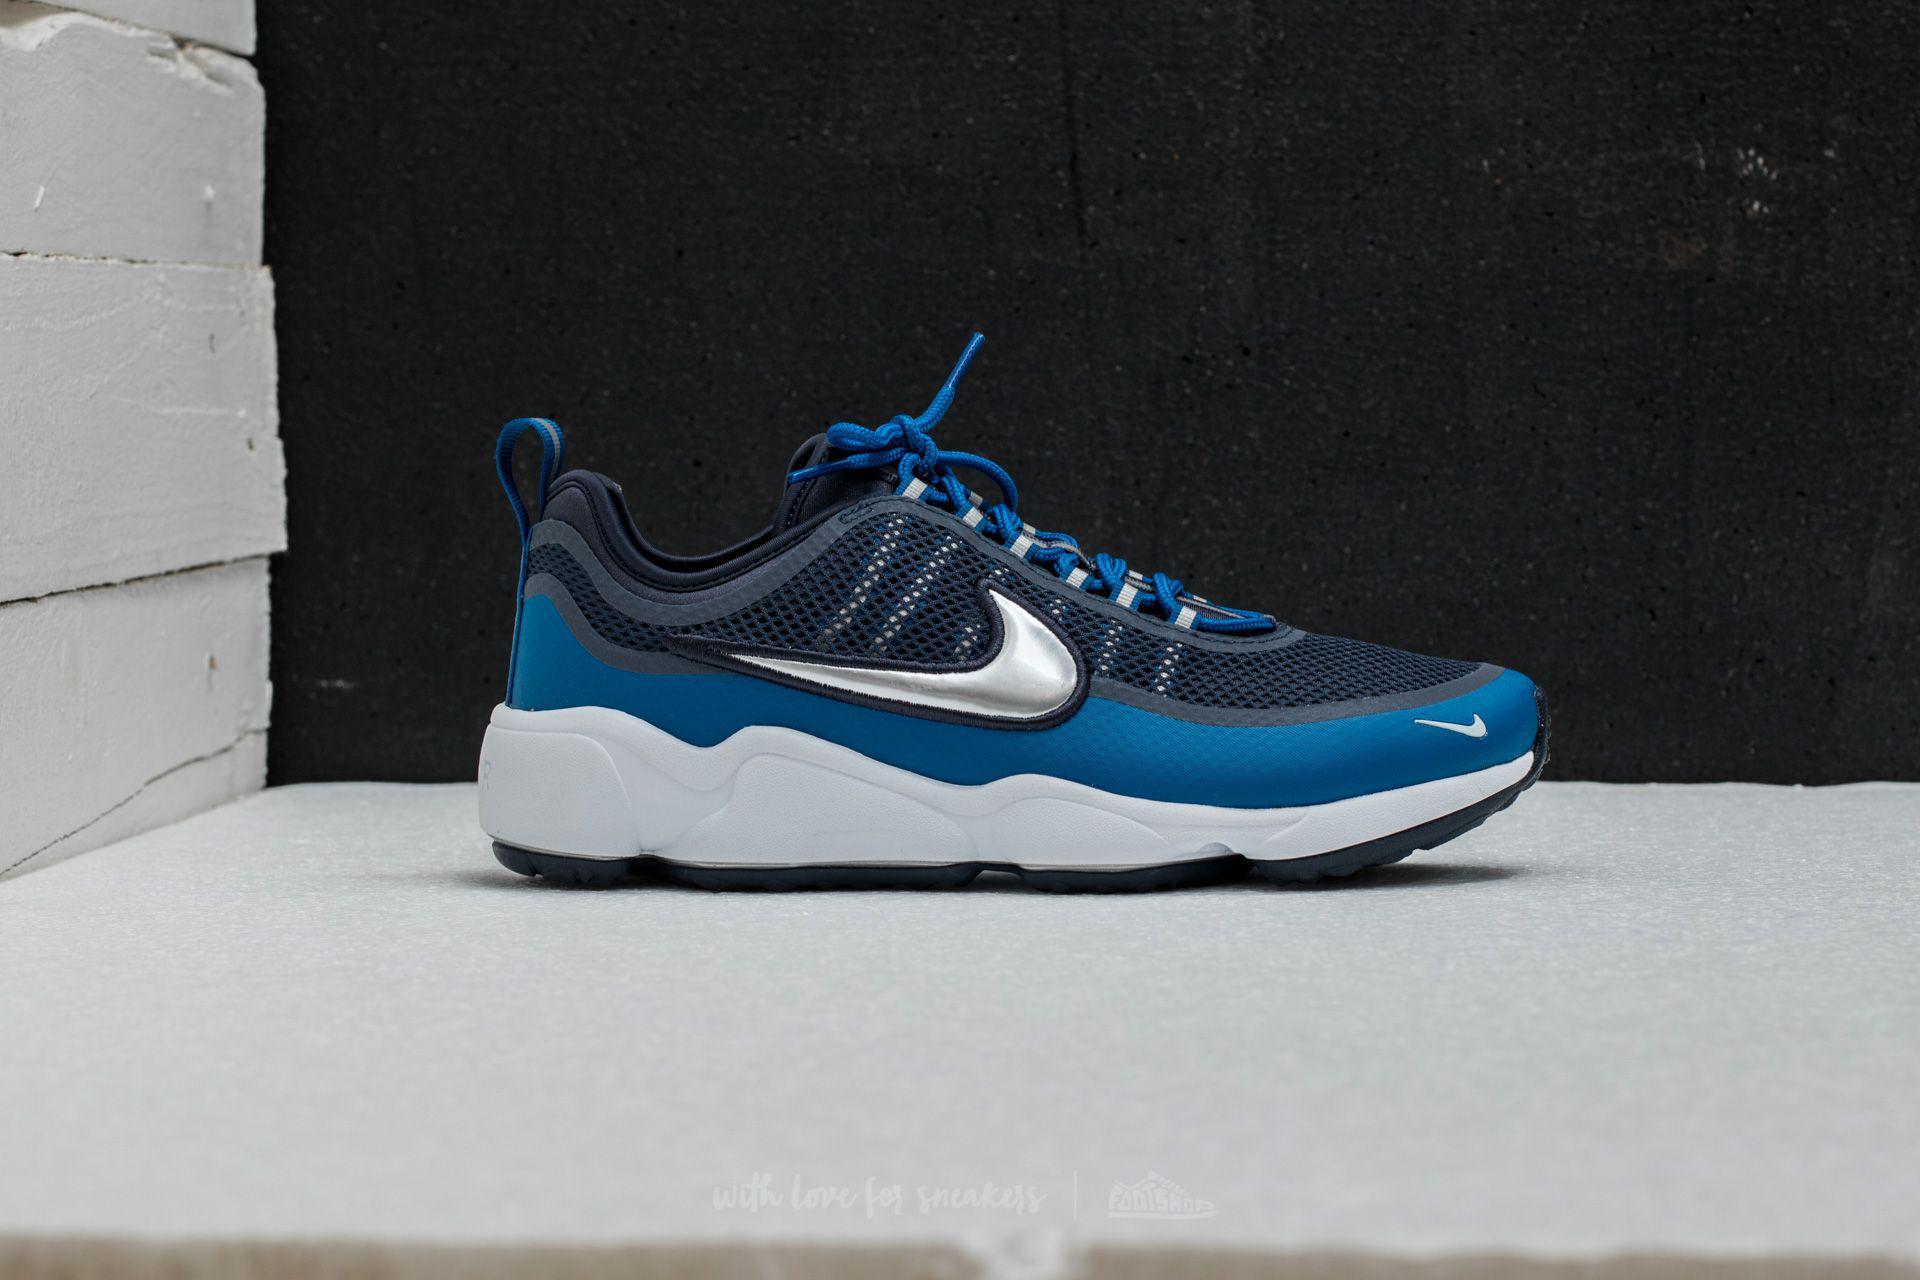 Lyst - Nike Zoom Spiridon Armory Blue  Metallic Platinum in Blue for Men 9bb556ea5b78